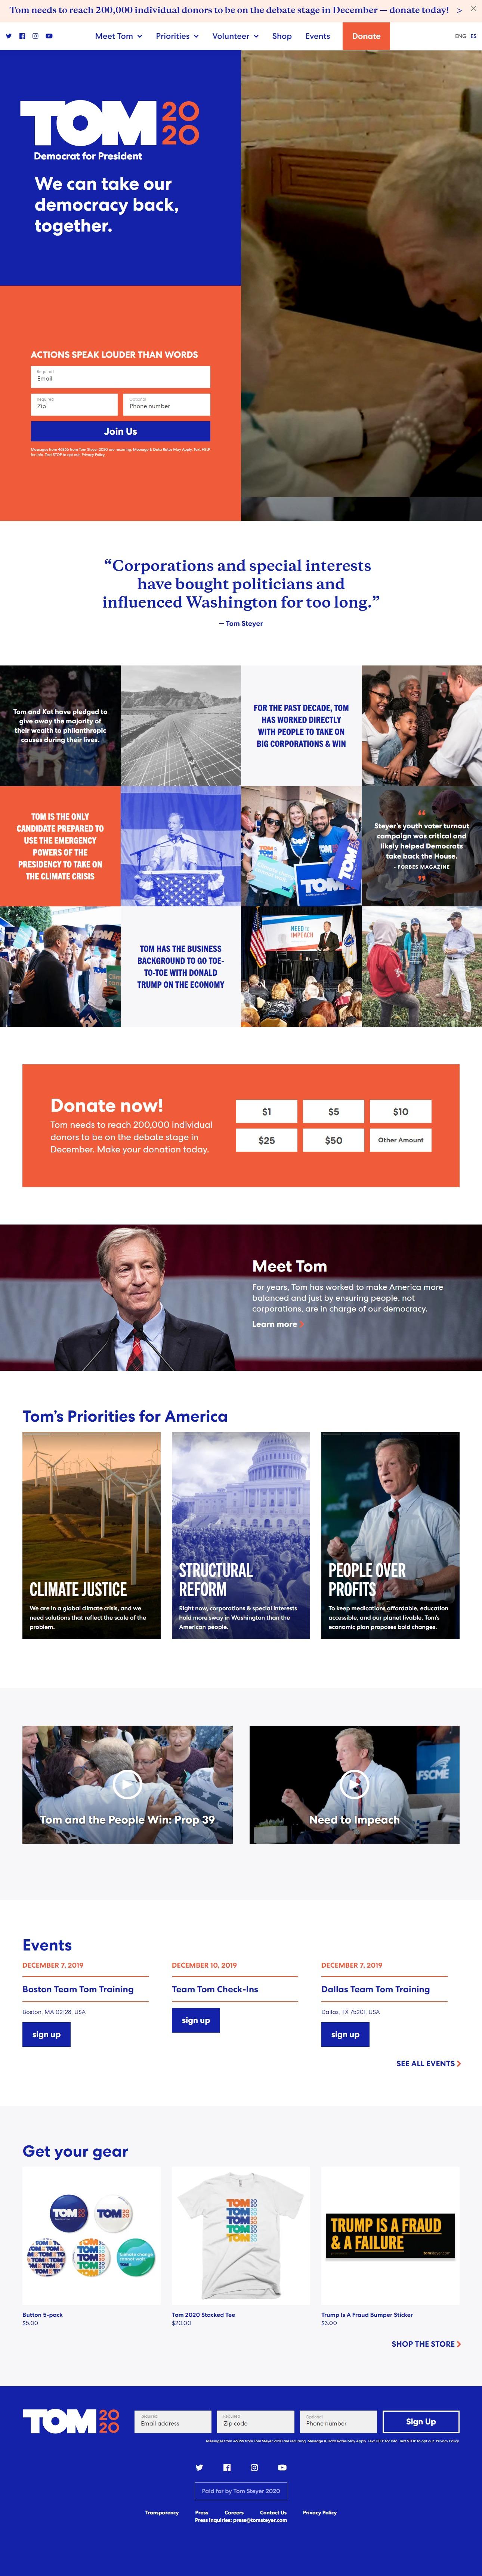 Homepage Snapshot for December 1, 2019: Businessperson Tom Steyer